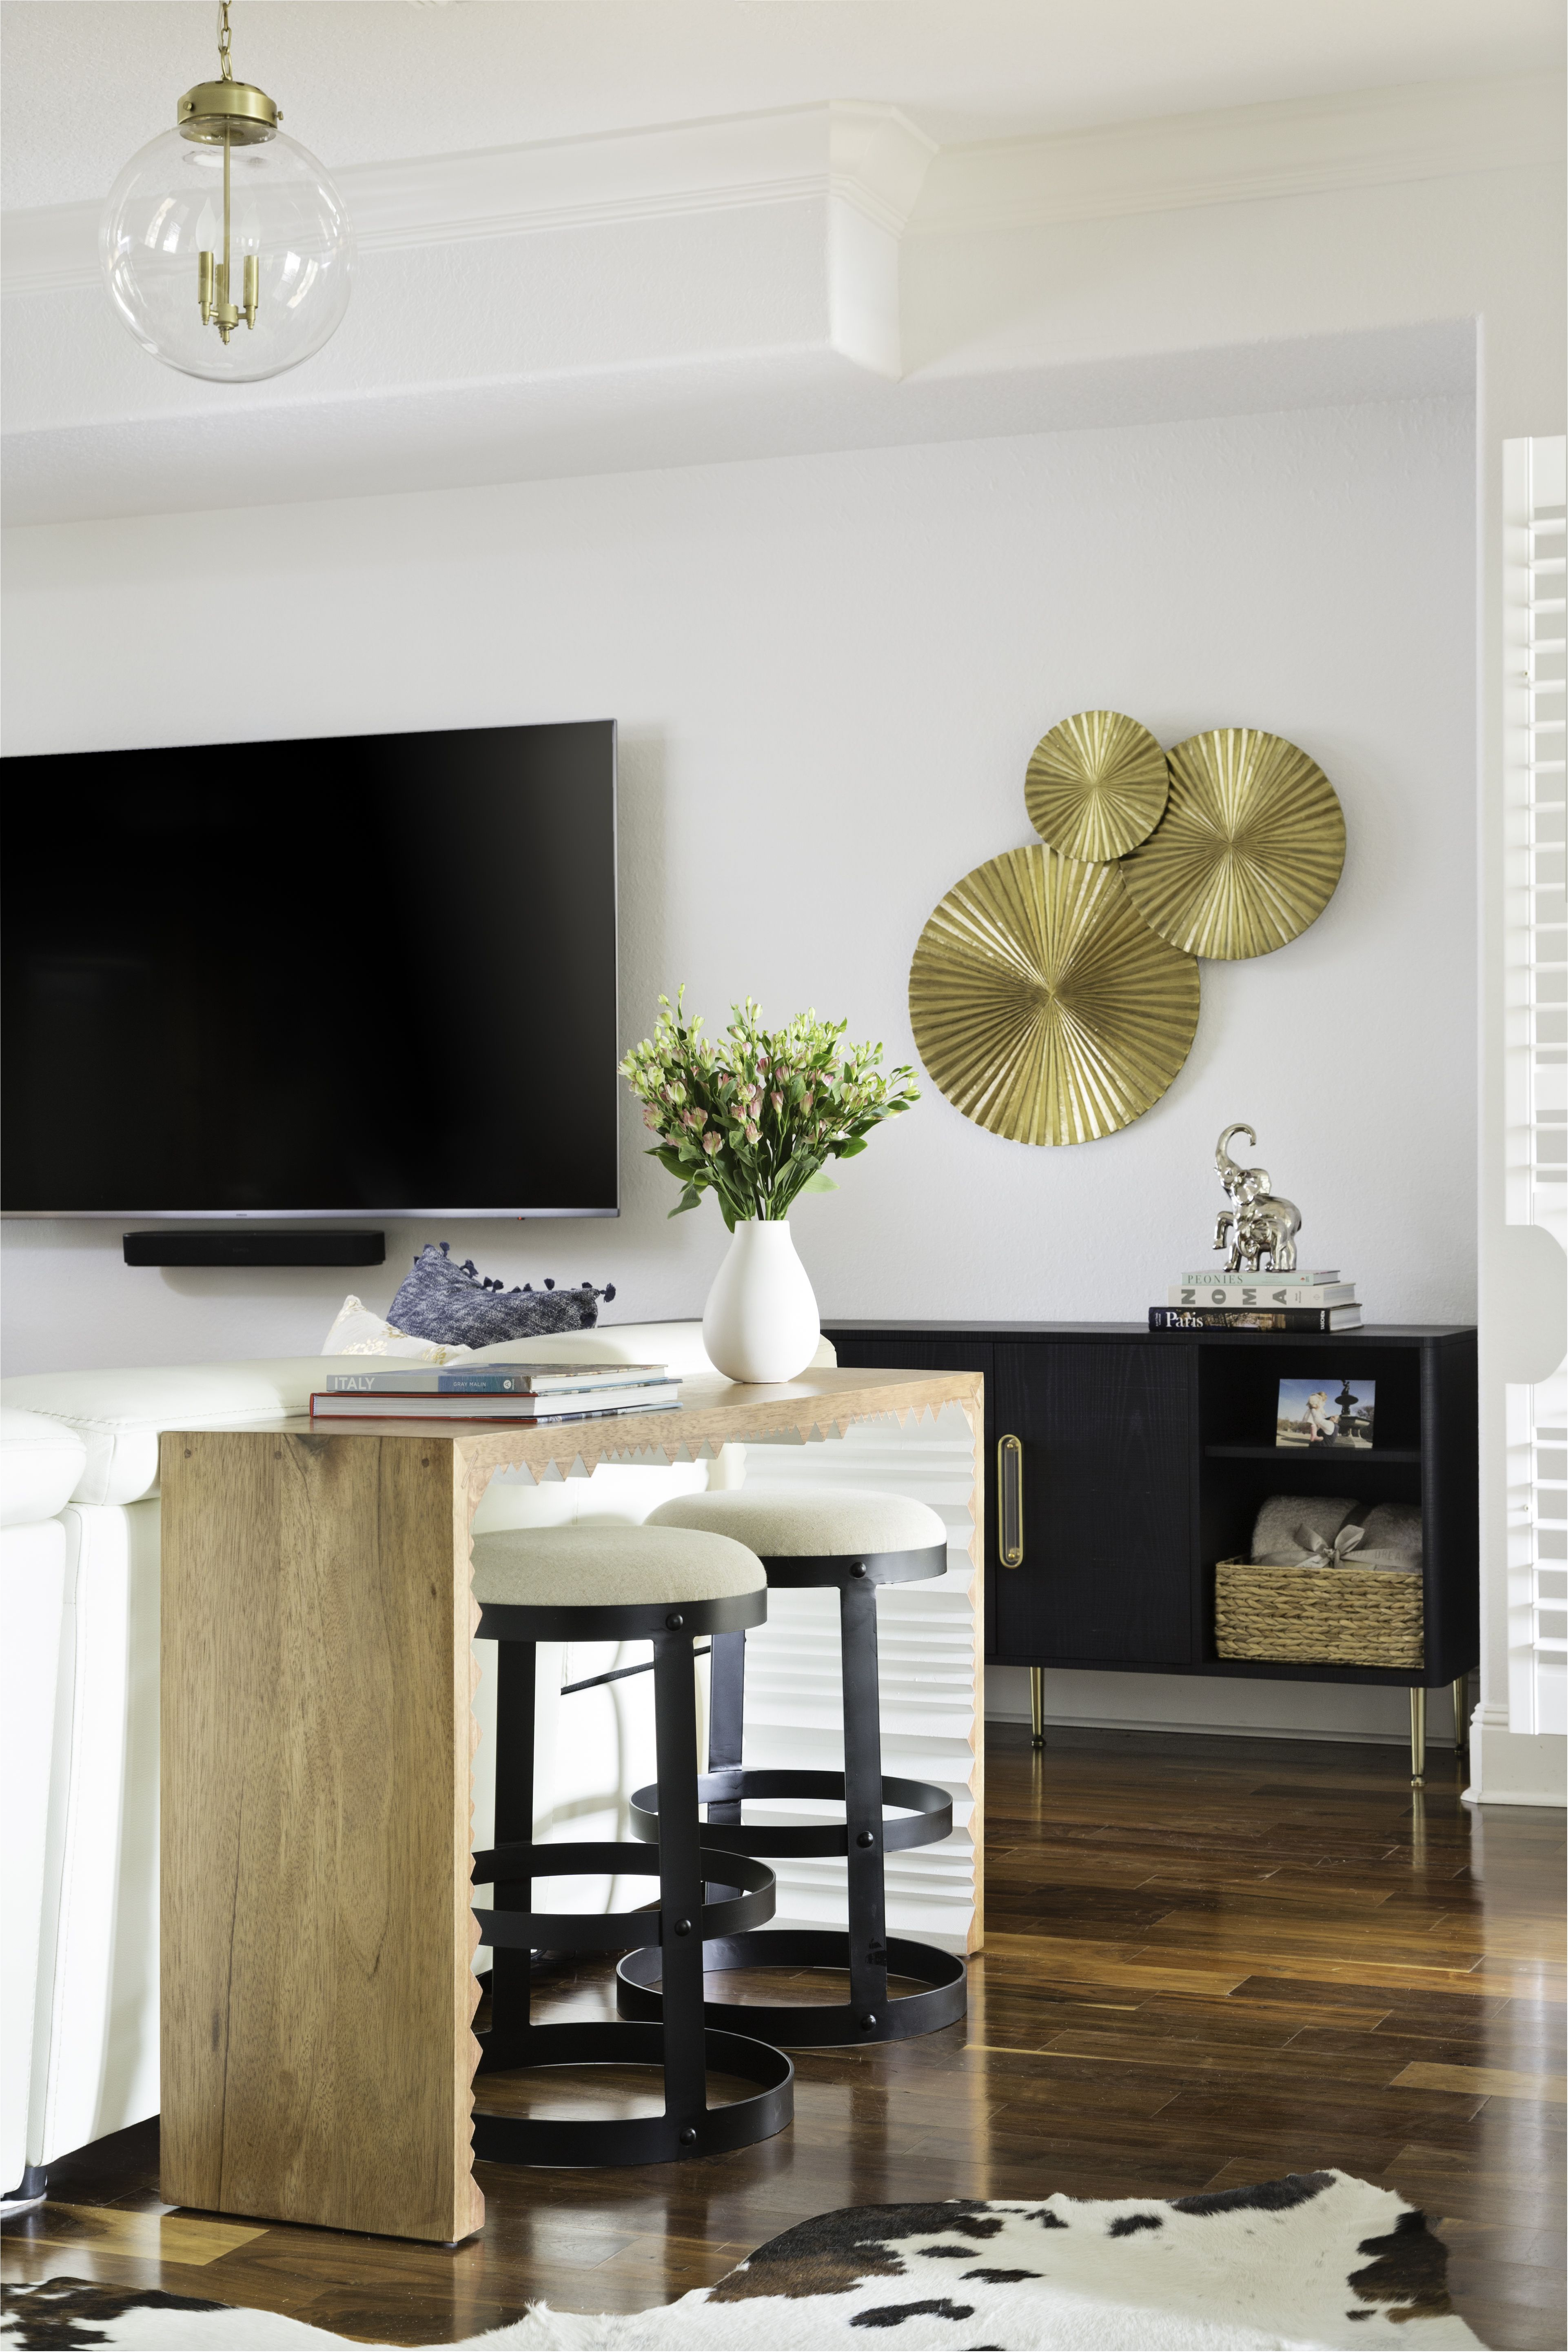 Living Room | St. Petersburg, FL | Living room designs ...